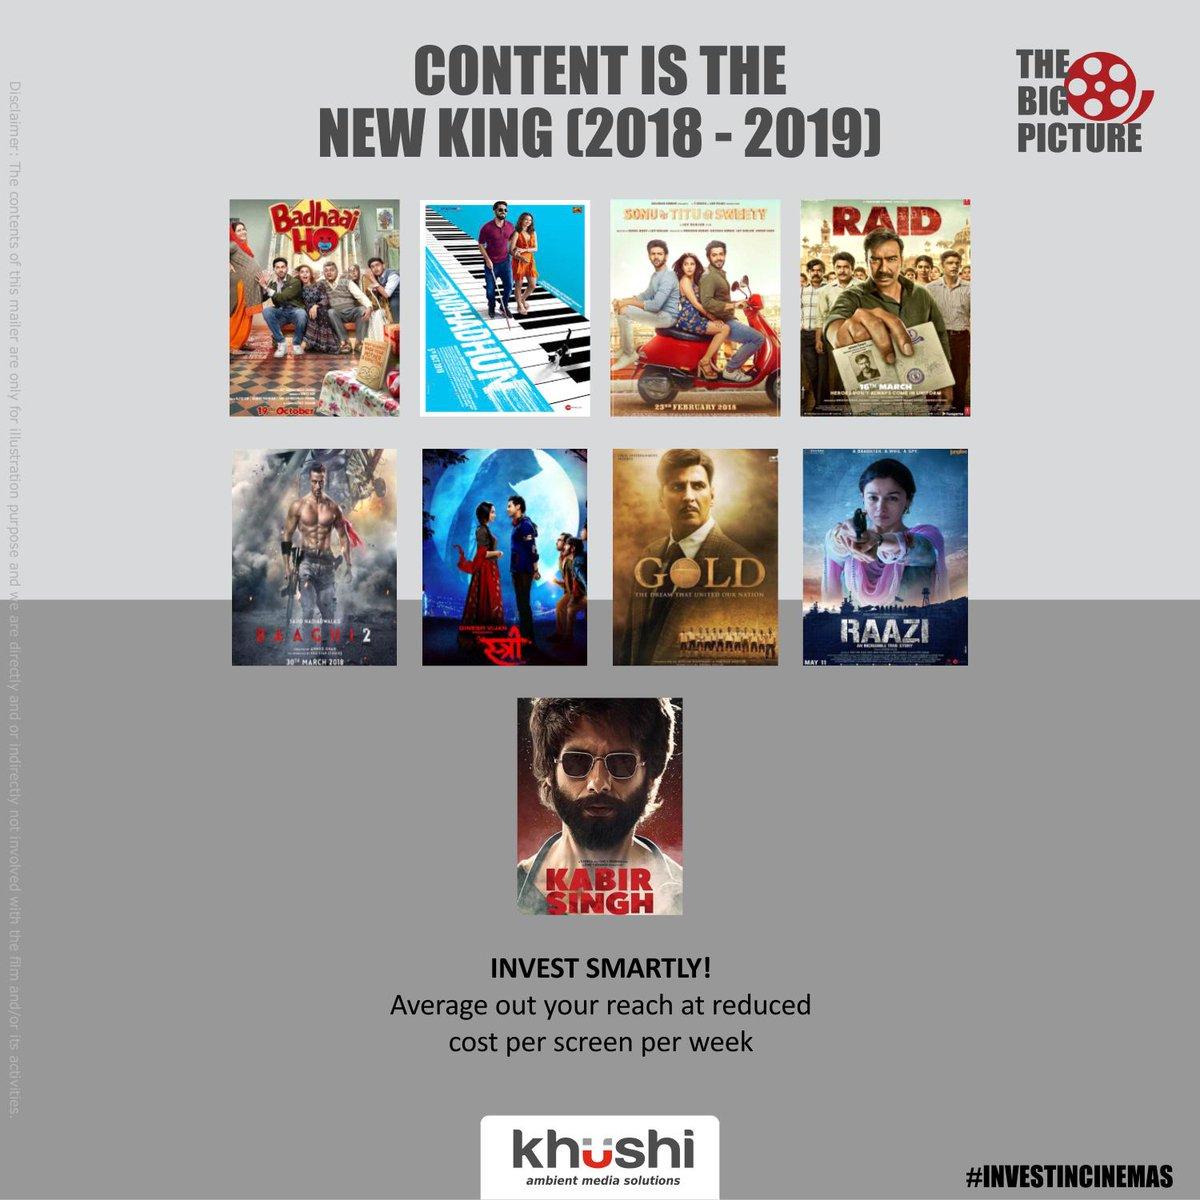 khushiambient hashtag on Twitter